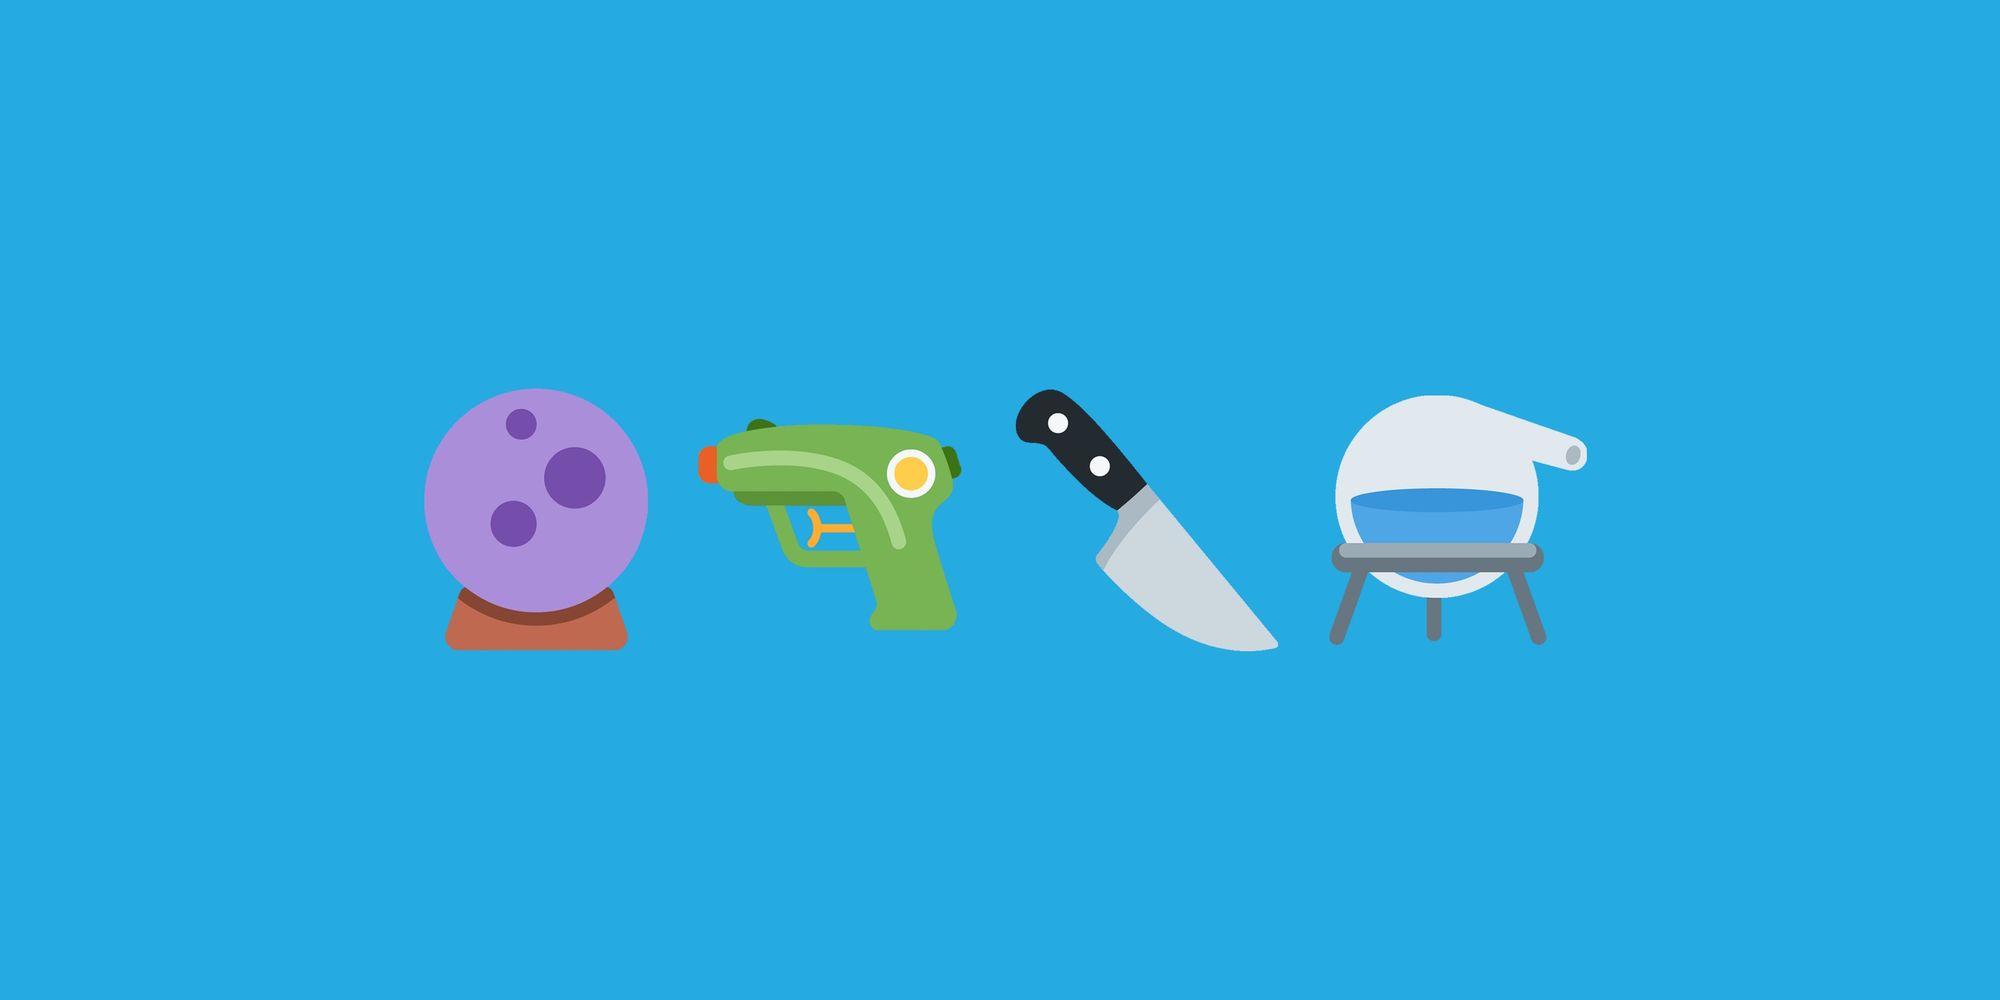 Twemoji 2.6 Emoji Changelog